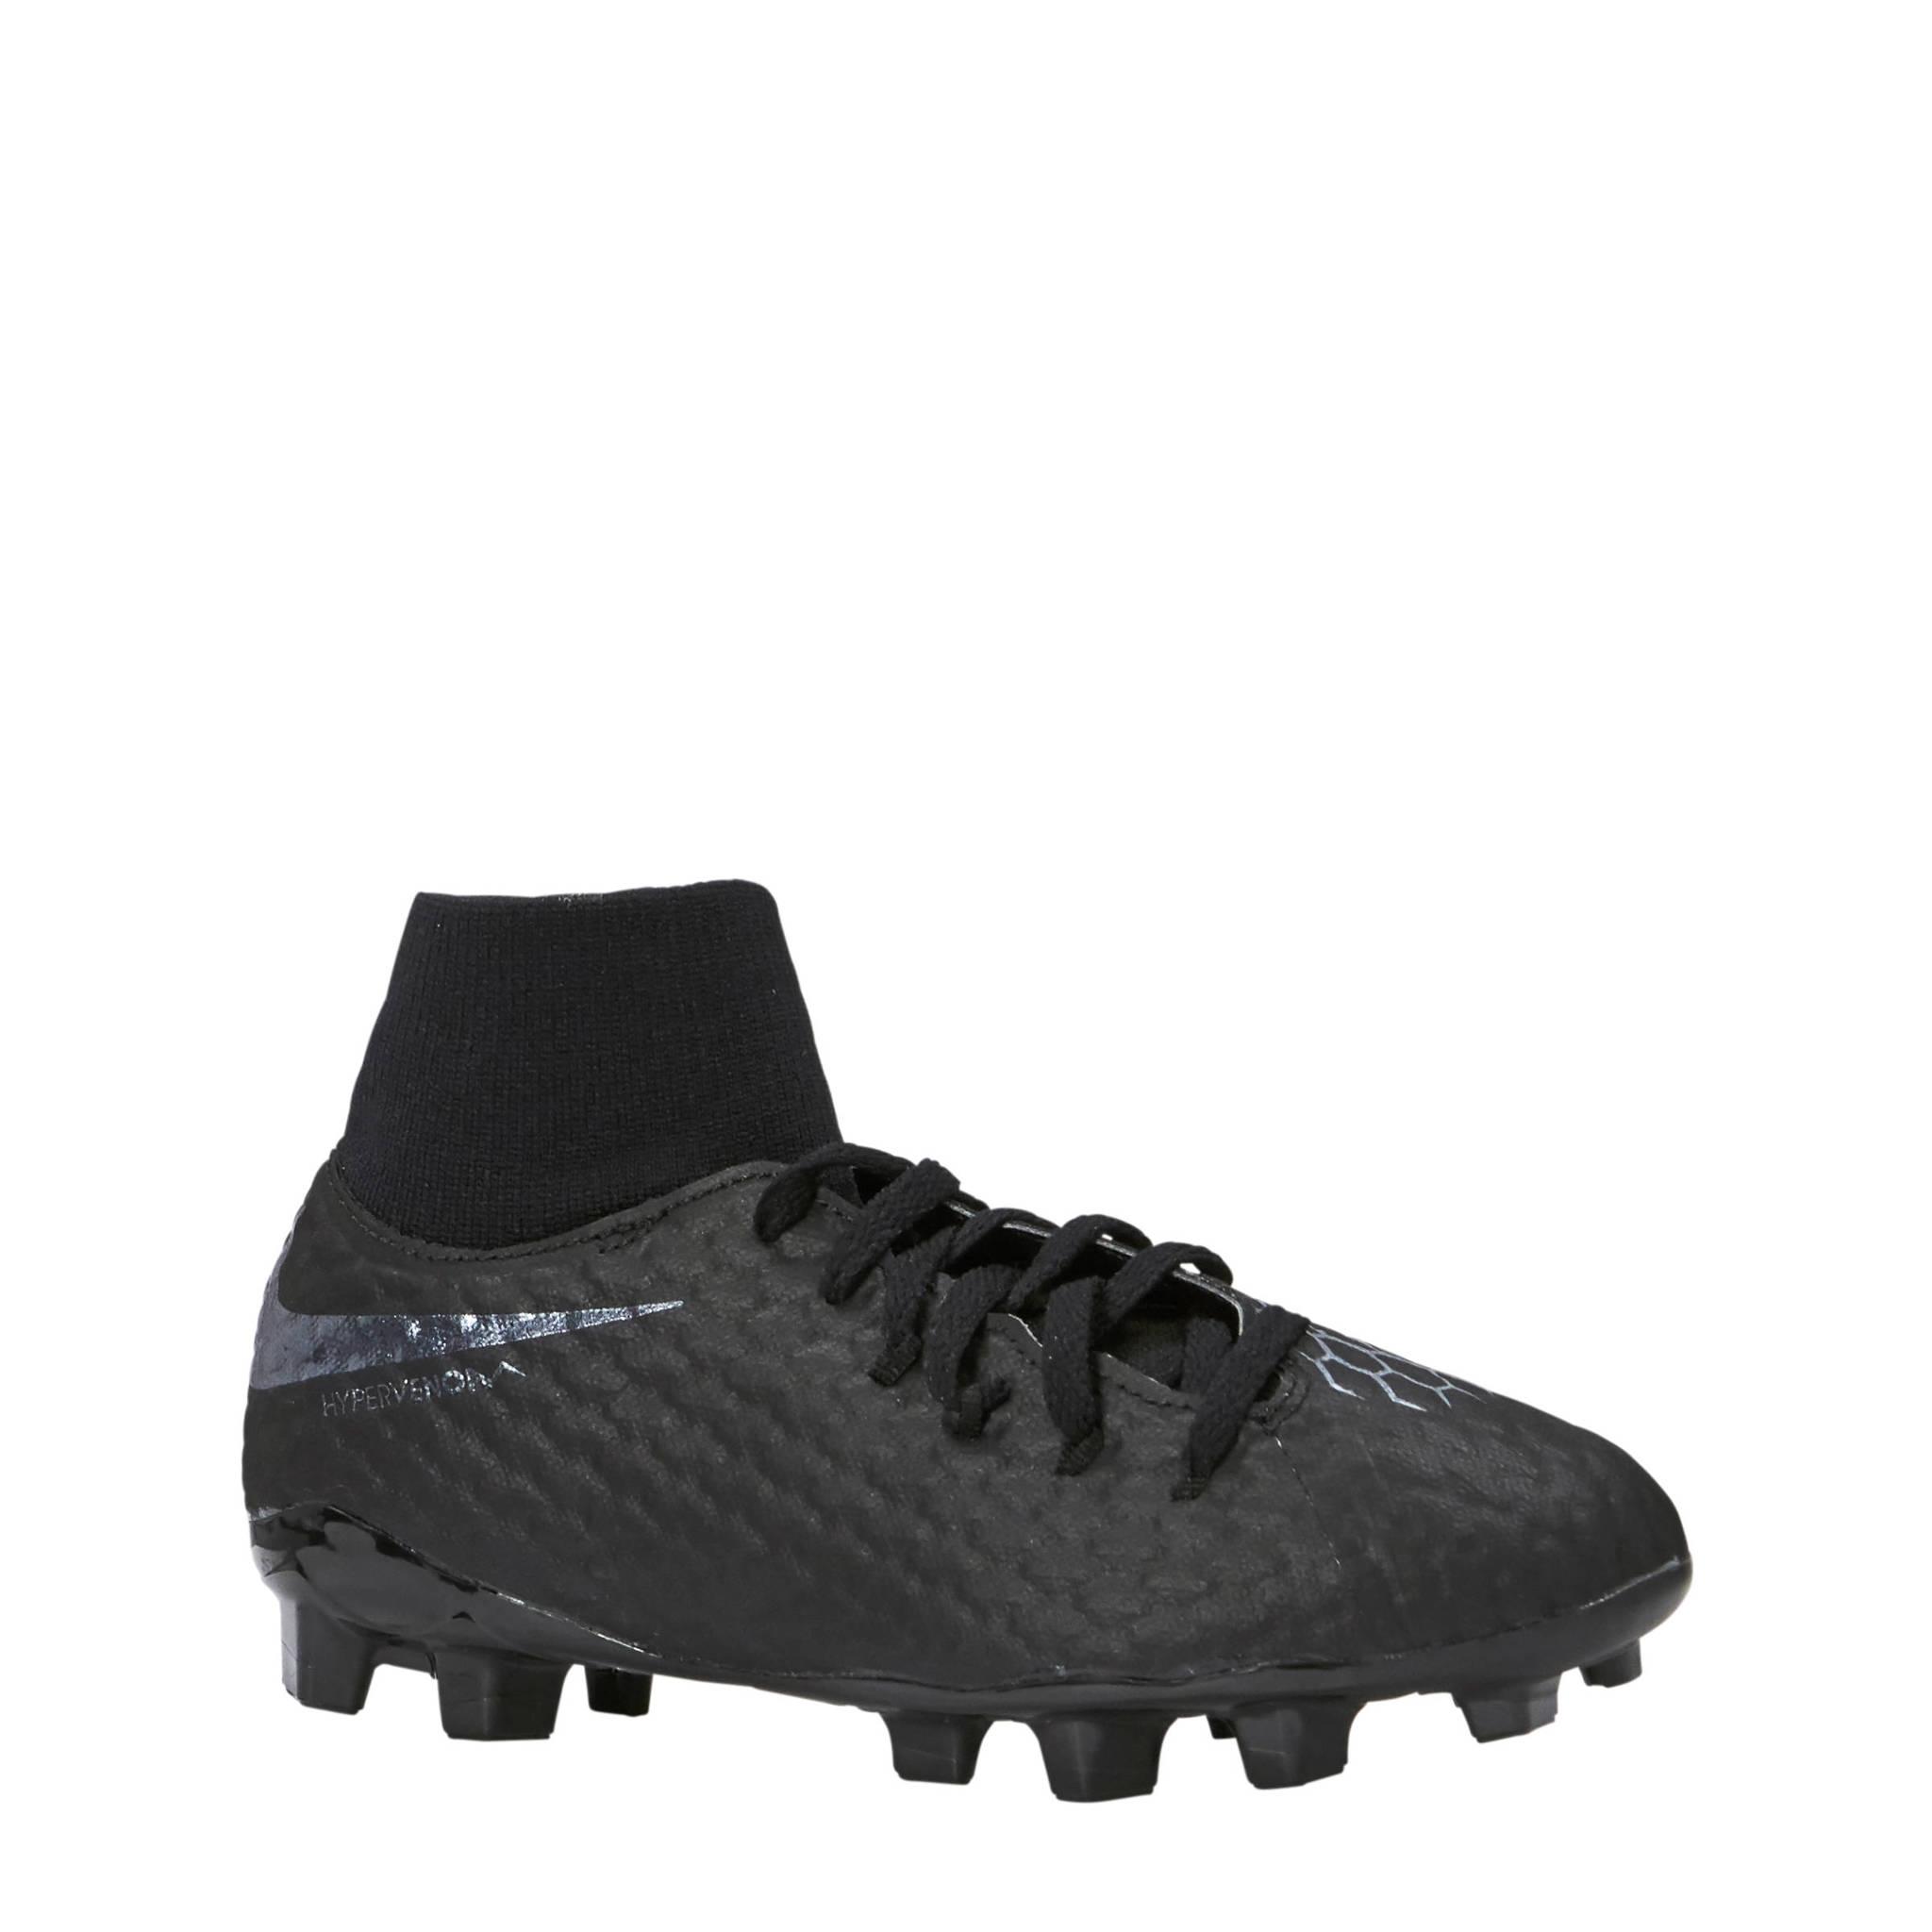 newest 912ac f887e Nike Hypervenom 3 academy DF FG voetbalschoenen zwart  wehka